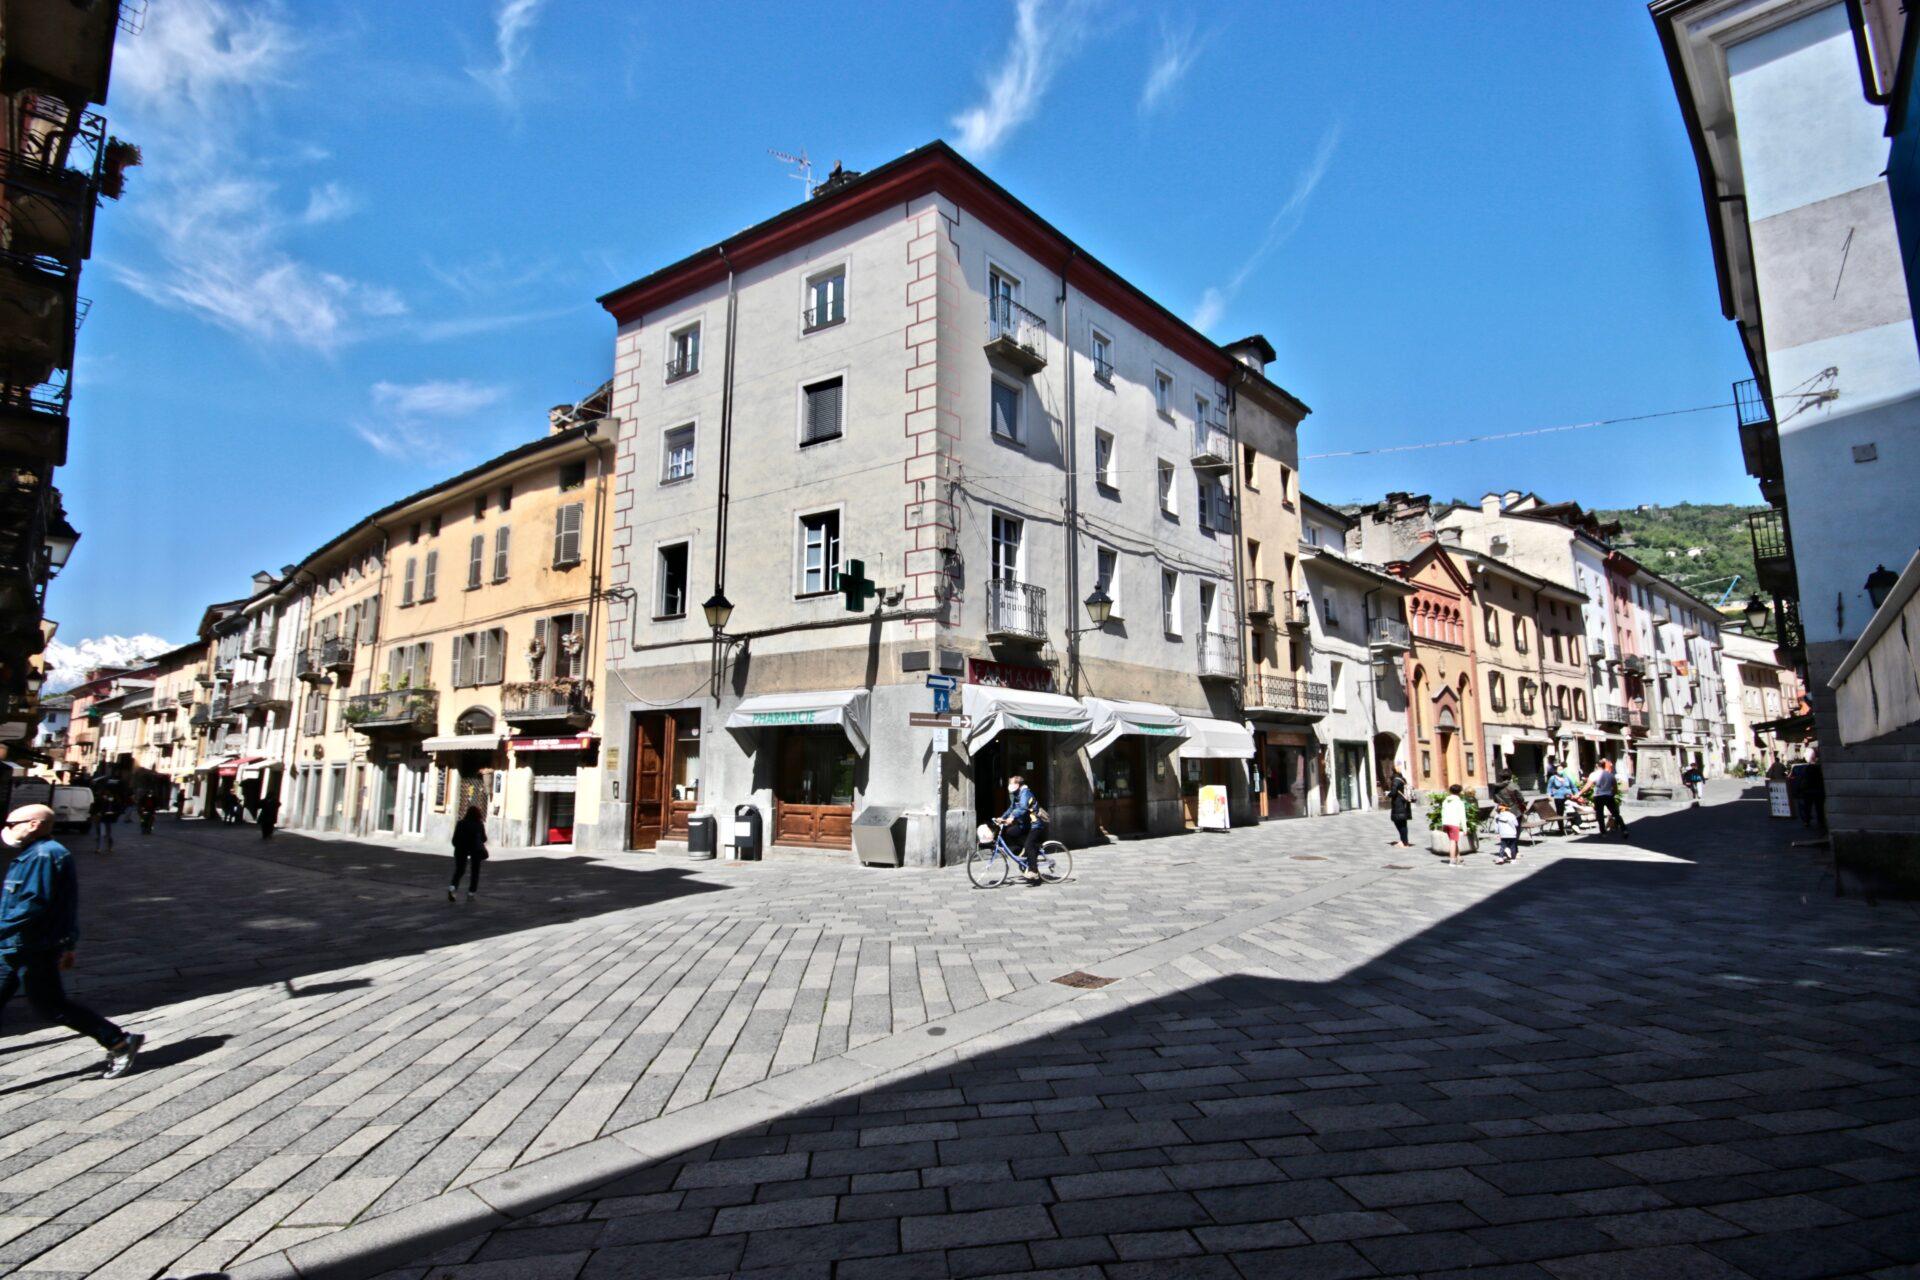 Aosta, fase 2, place des franchises